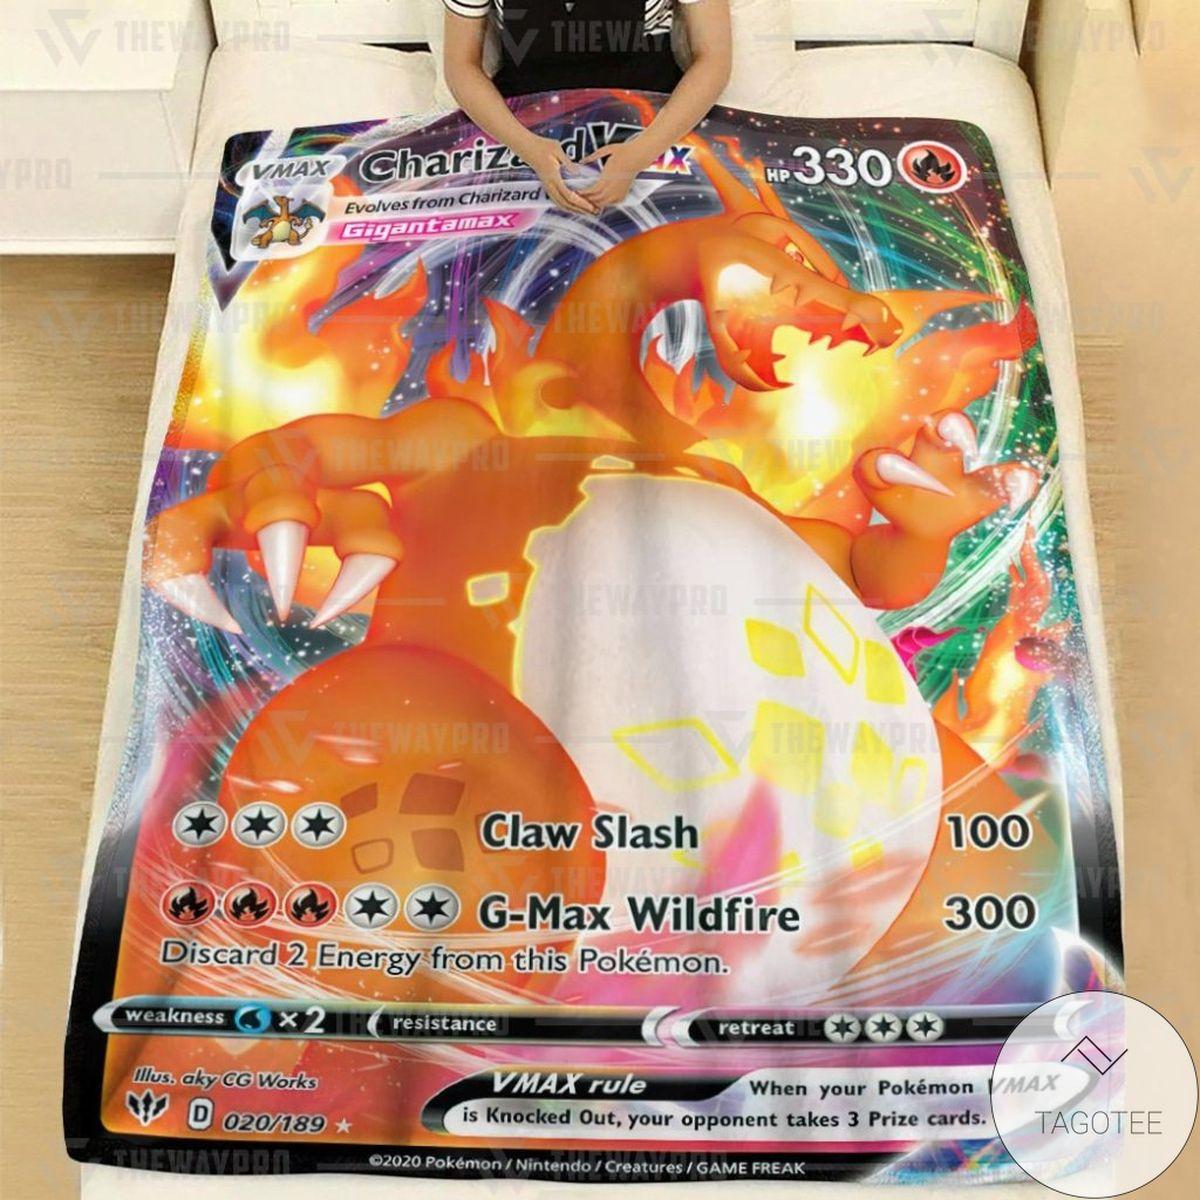 Anime Pokemon Charizard VMAX Darkness Ablaze Custom Blanket